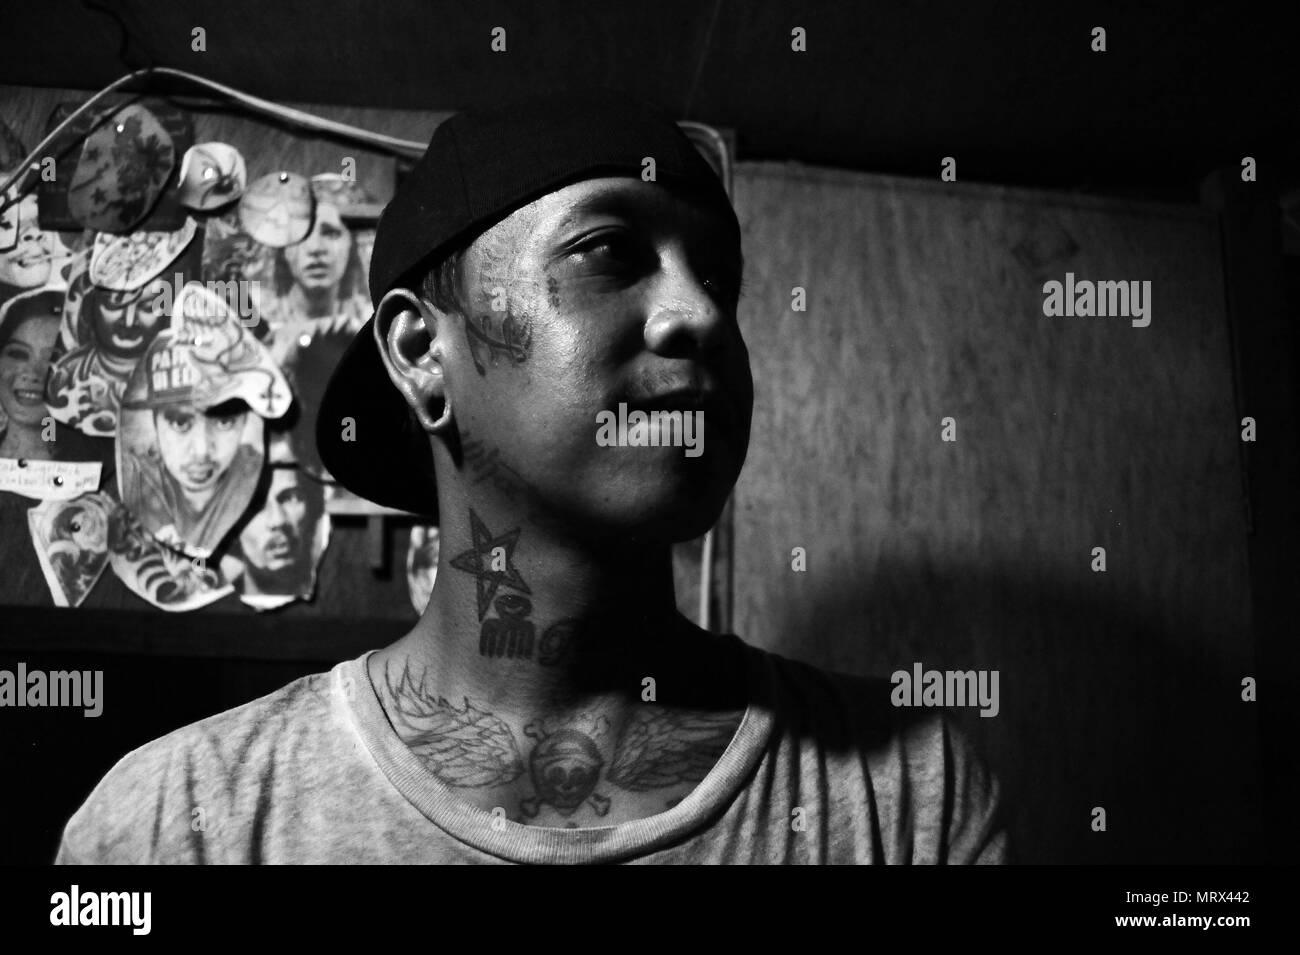 571a2acfe Bud`s Tattoo Studio, Sabang Beach, Black Moon Bar, Baler, Philippines